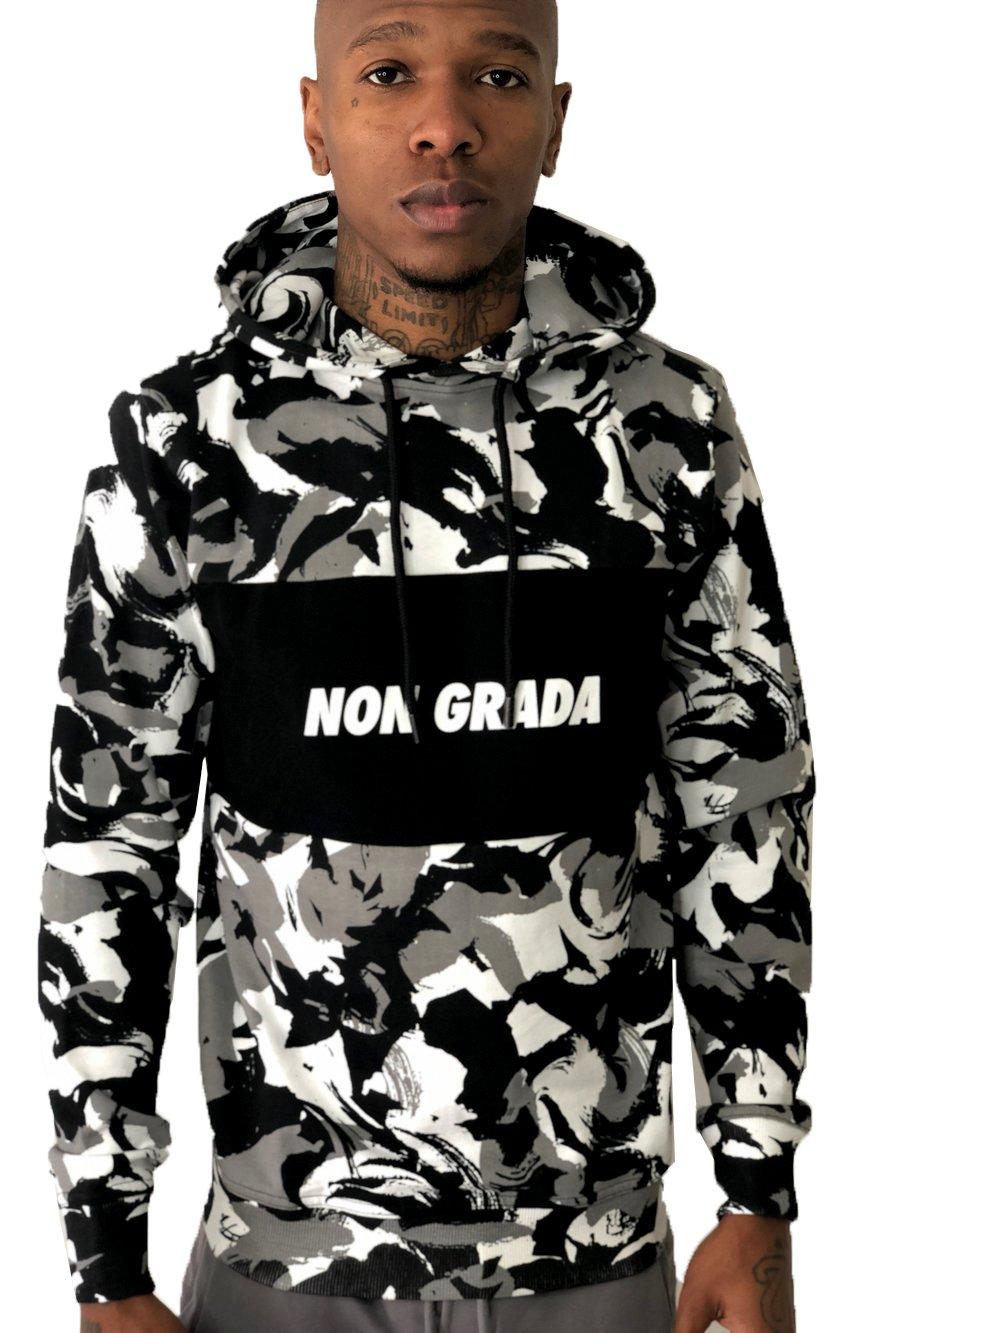 Non grada camo hoodie Good condition, never worn Depop